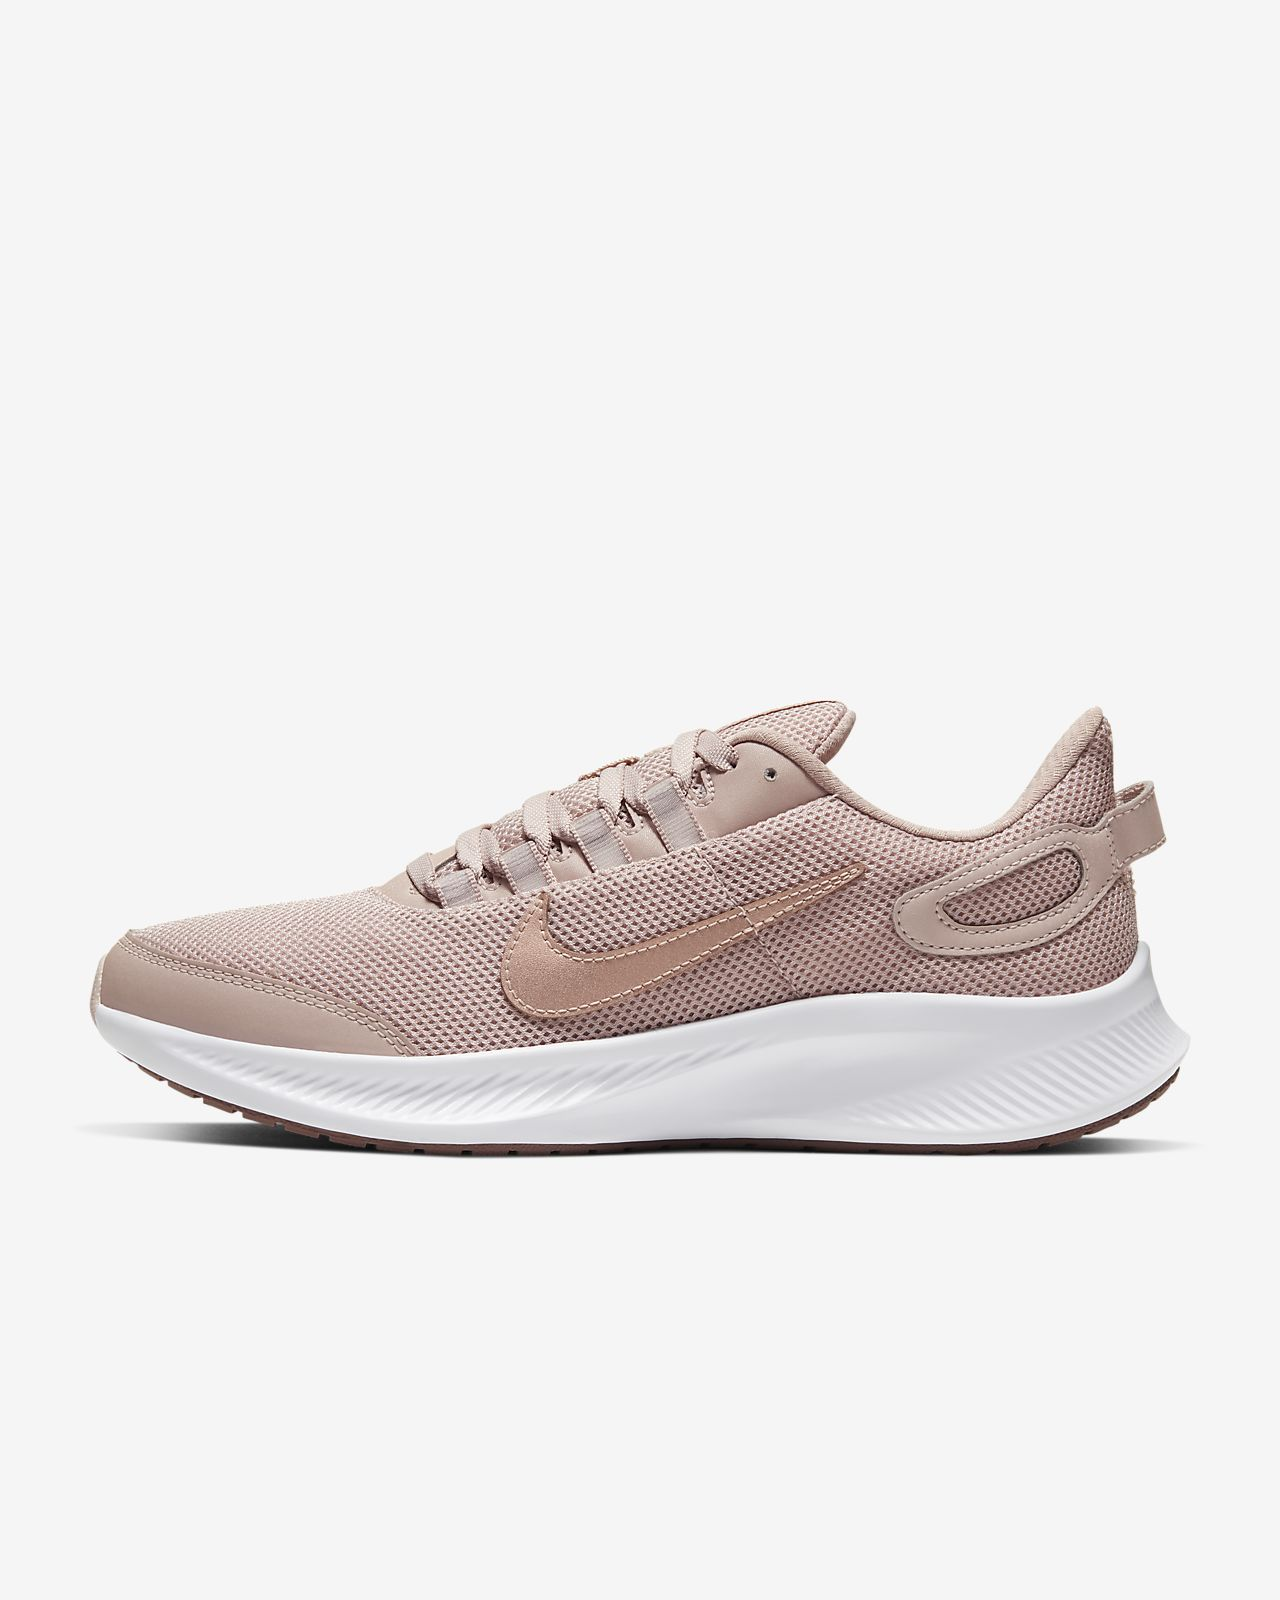 Women's Air Force 1 Metallic 'Bronze' Release Date. Nike